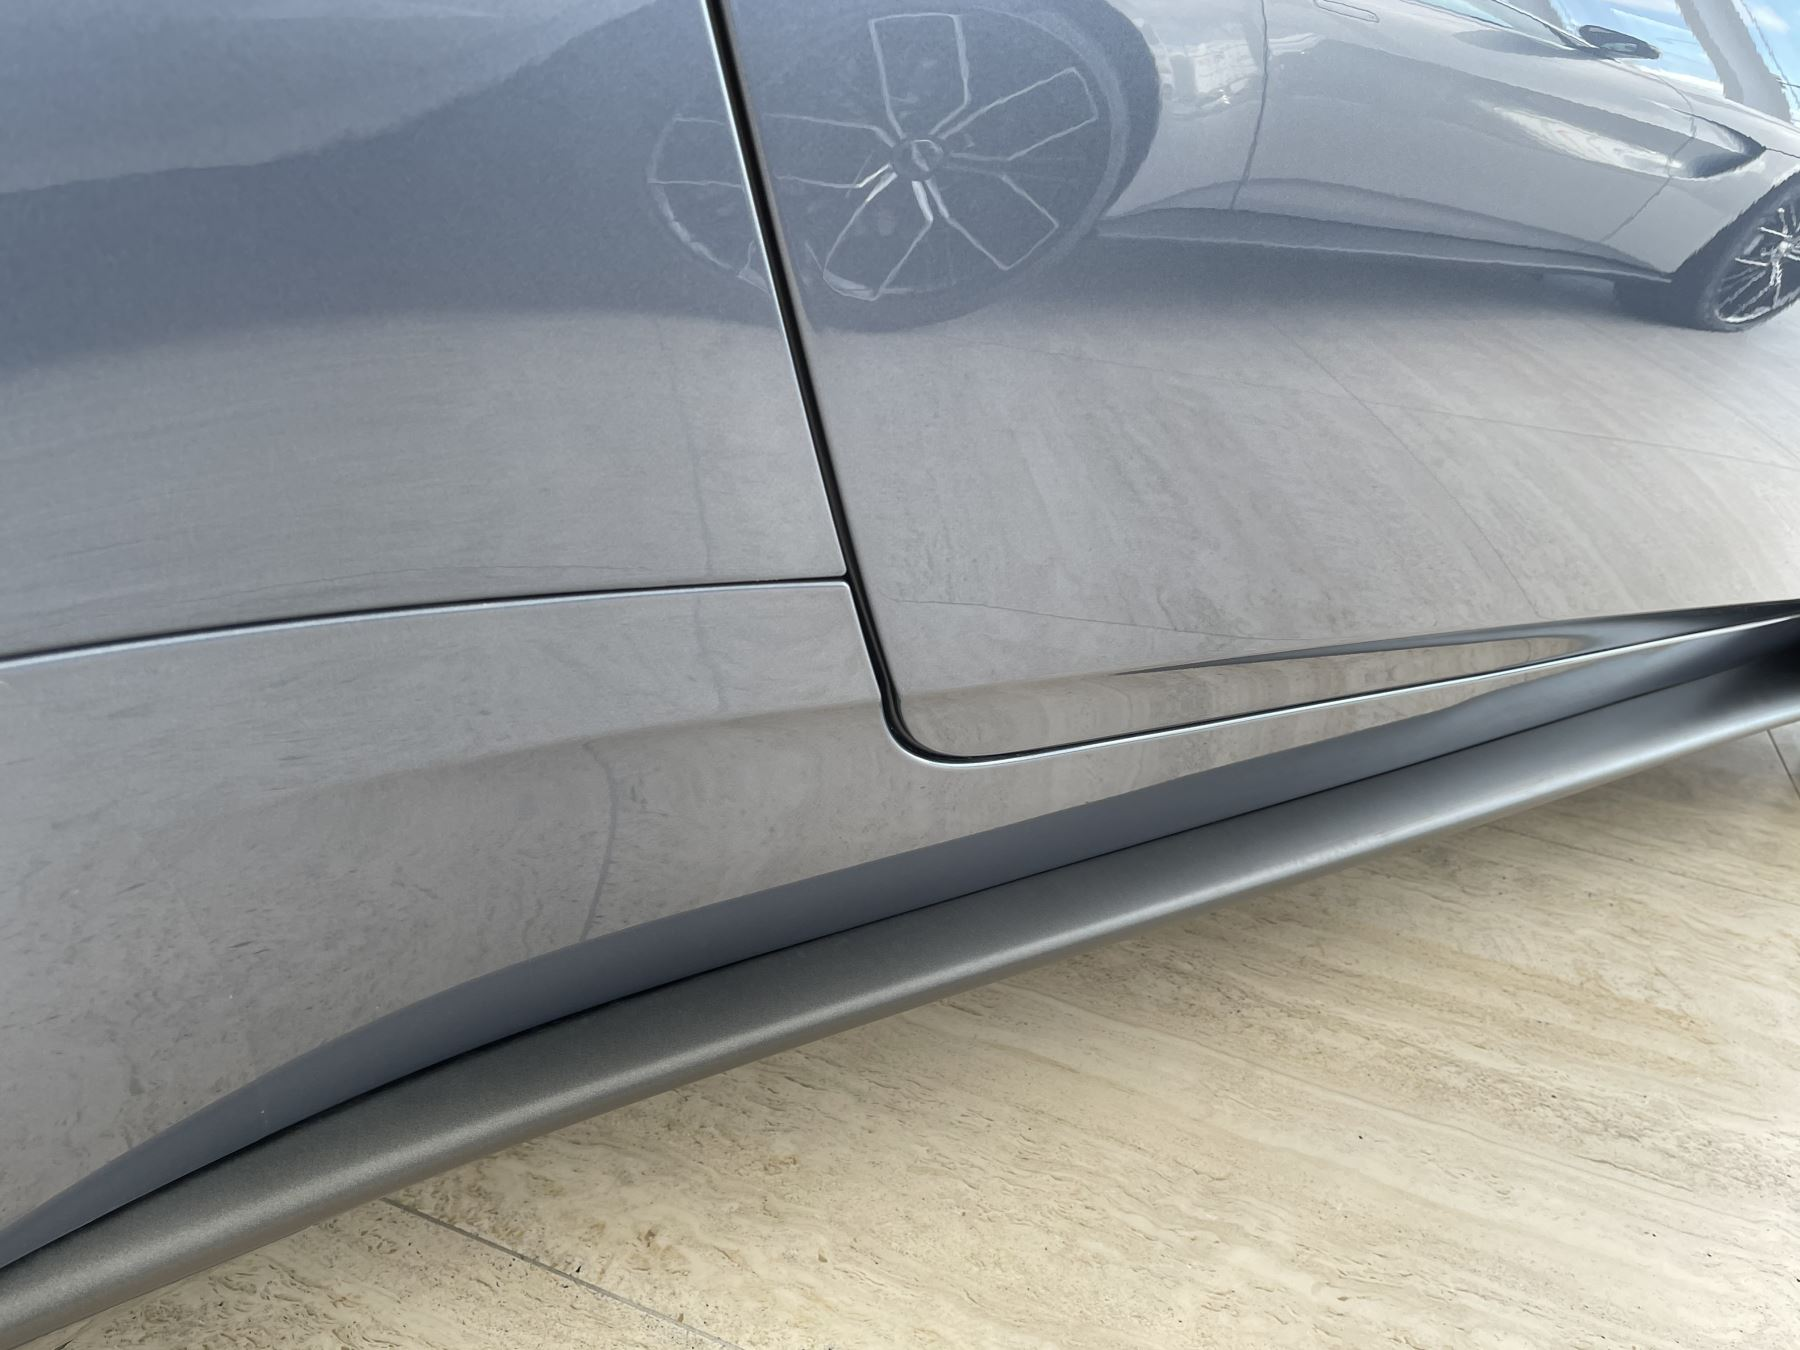 Aston Martin DB11 V8 Touchtronic image 17